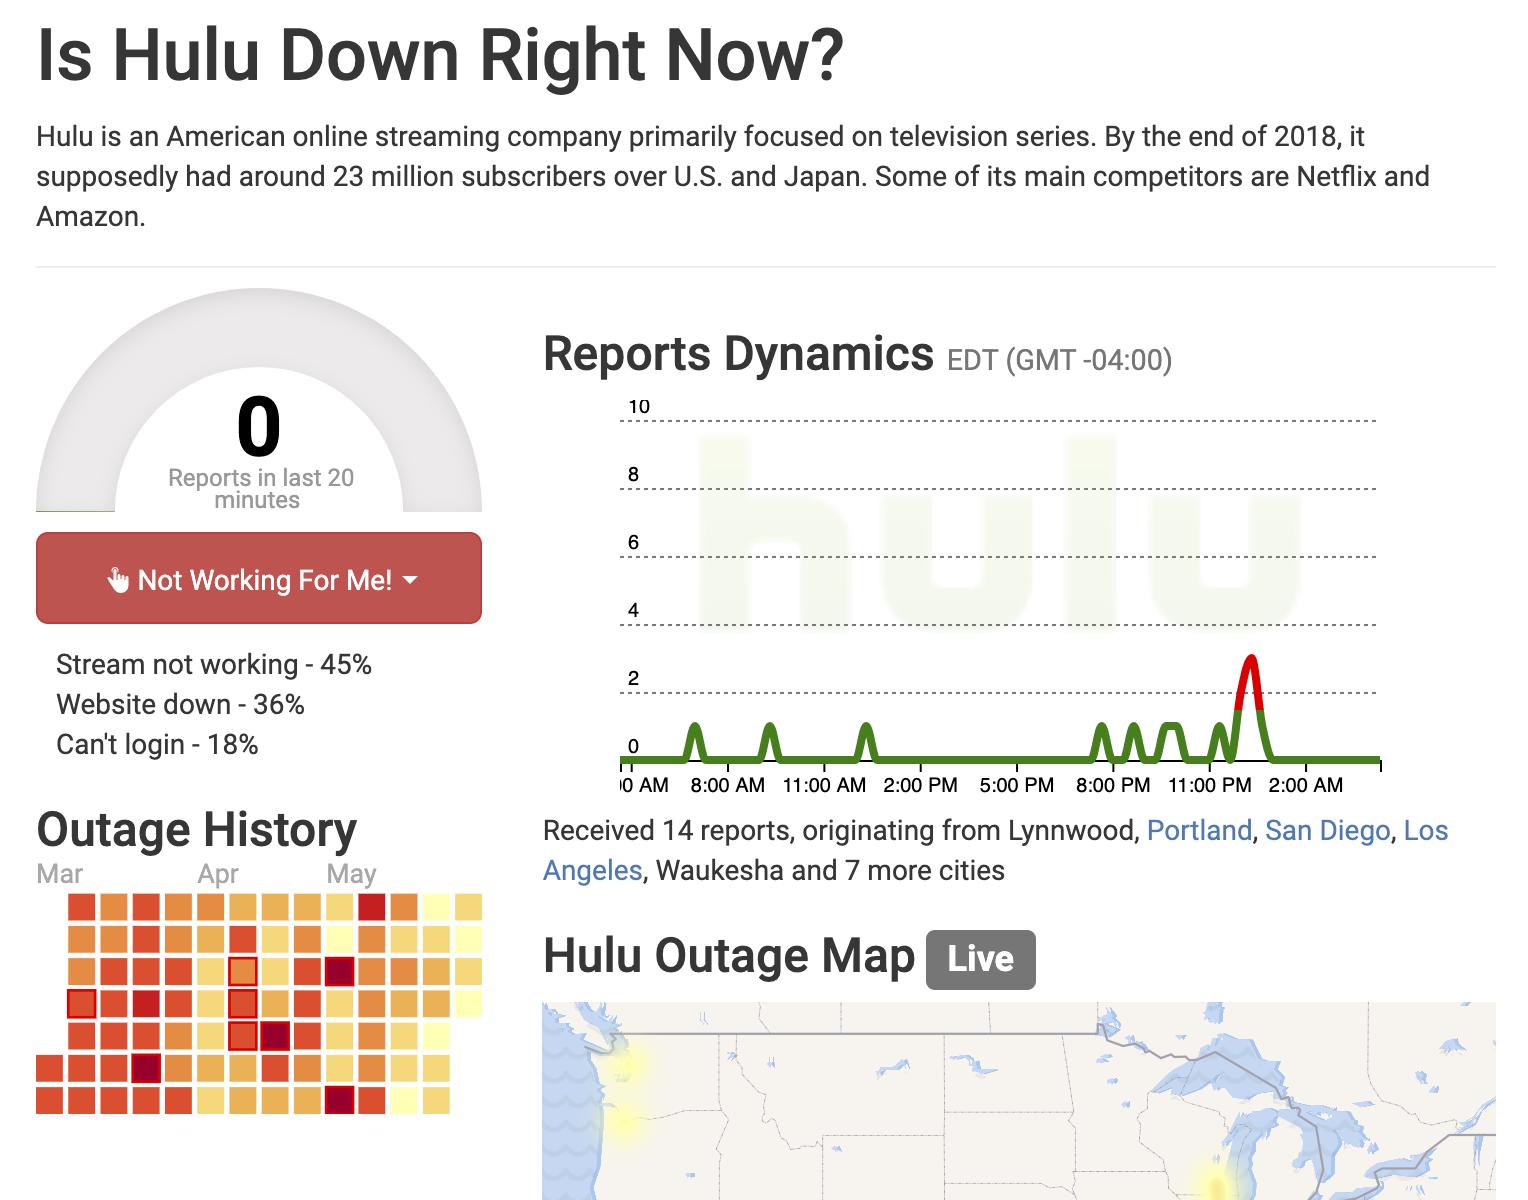 Hulu Outage Report